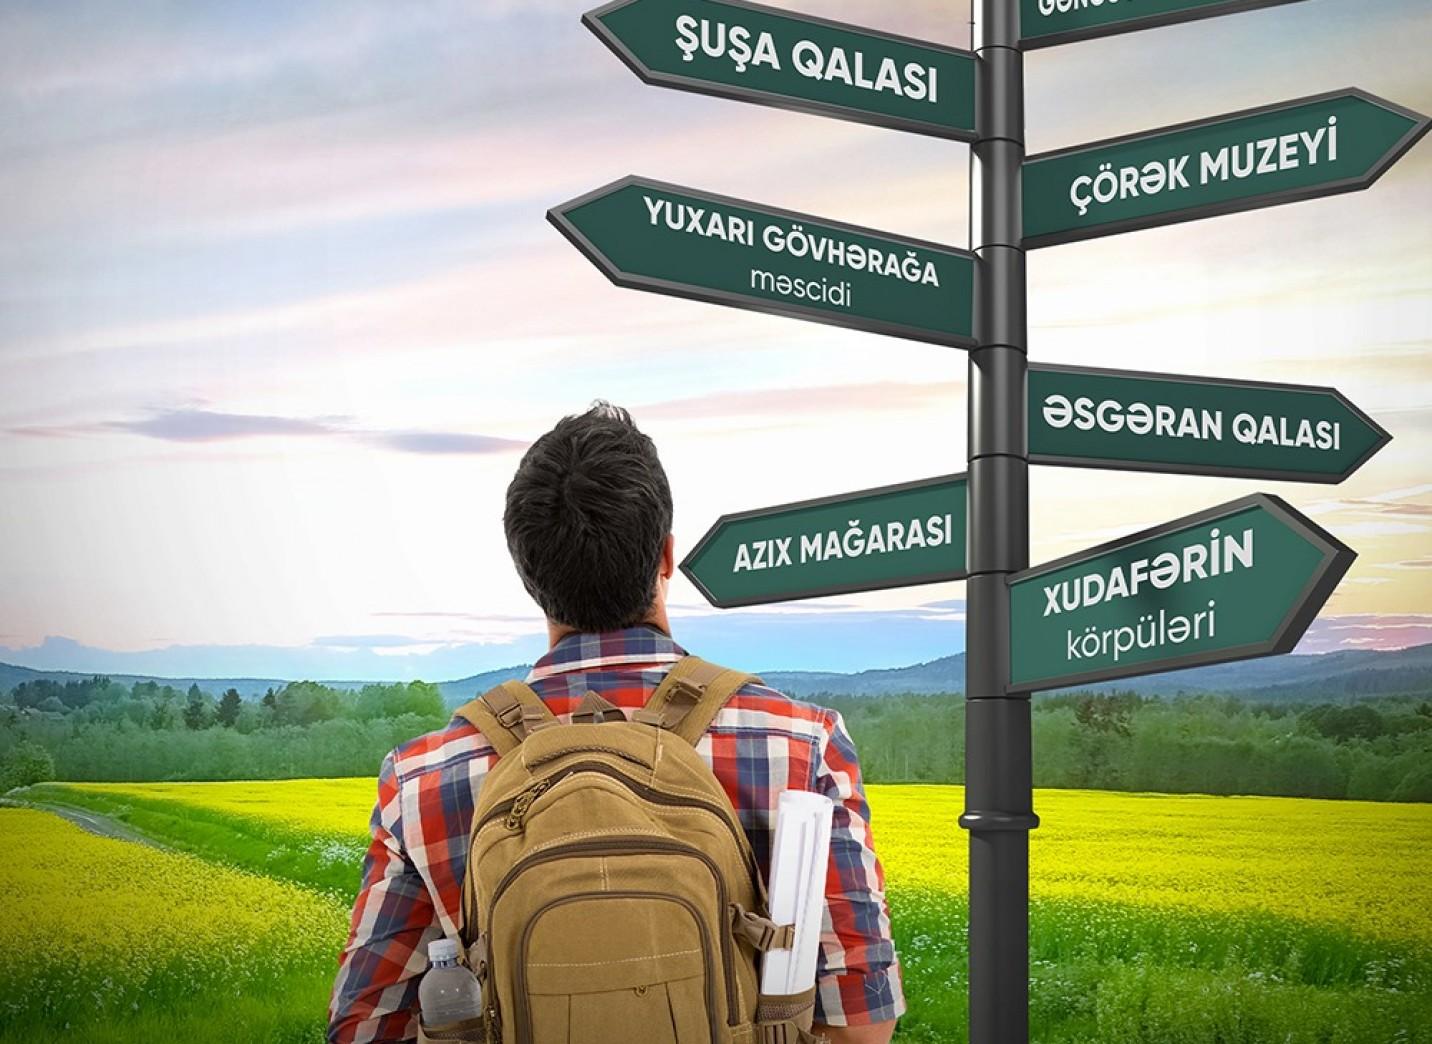 Вебинары по измерению потенциала туризма Карабаха